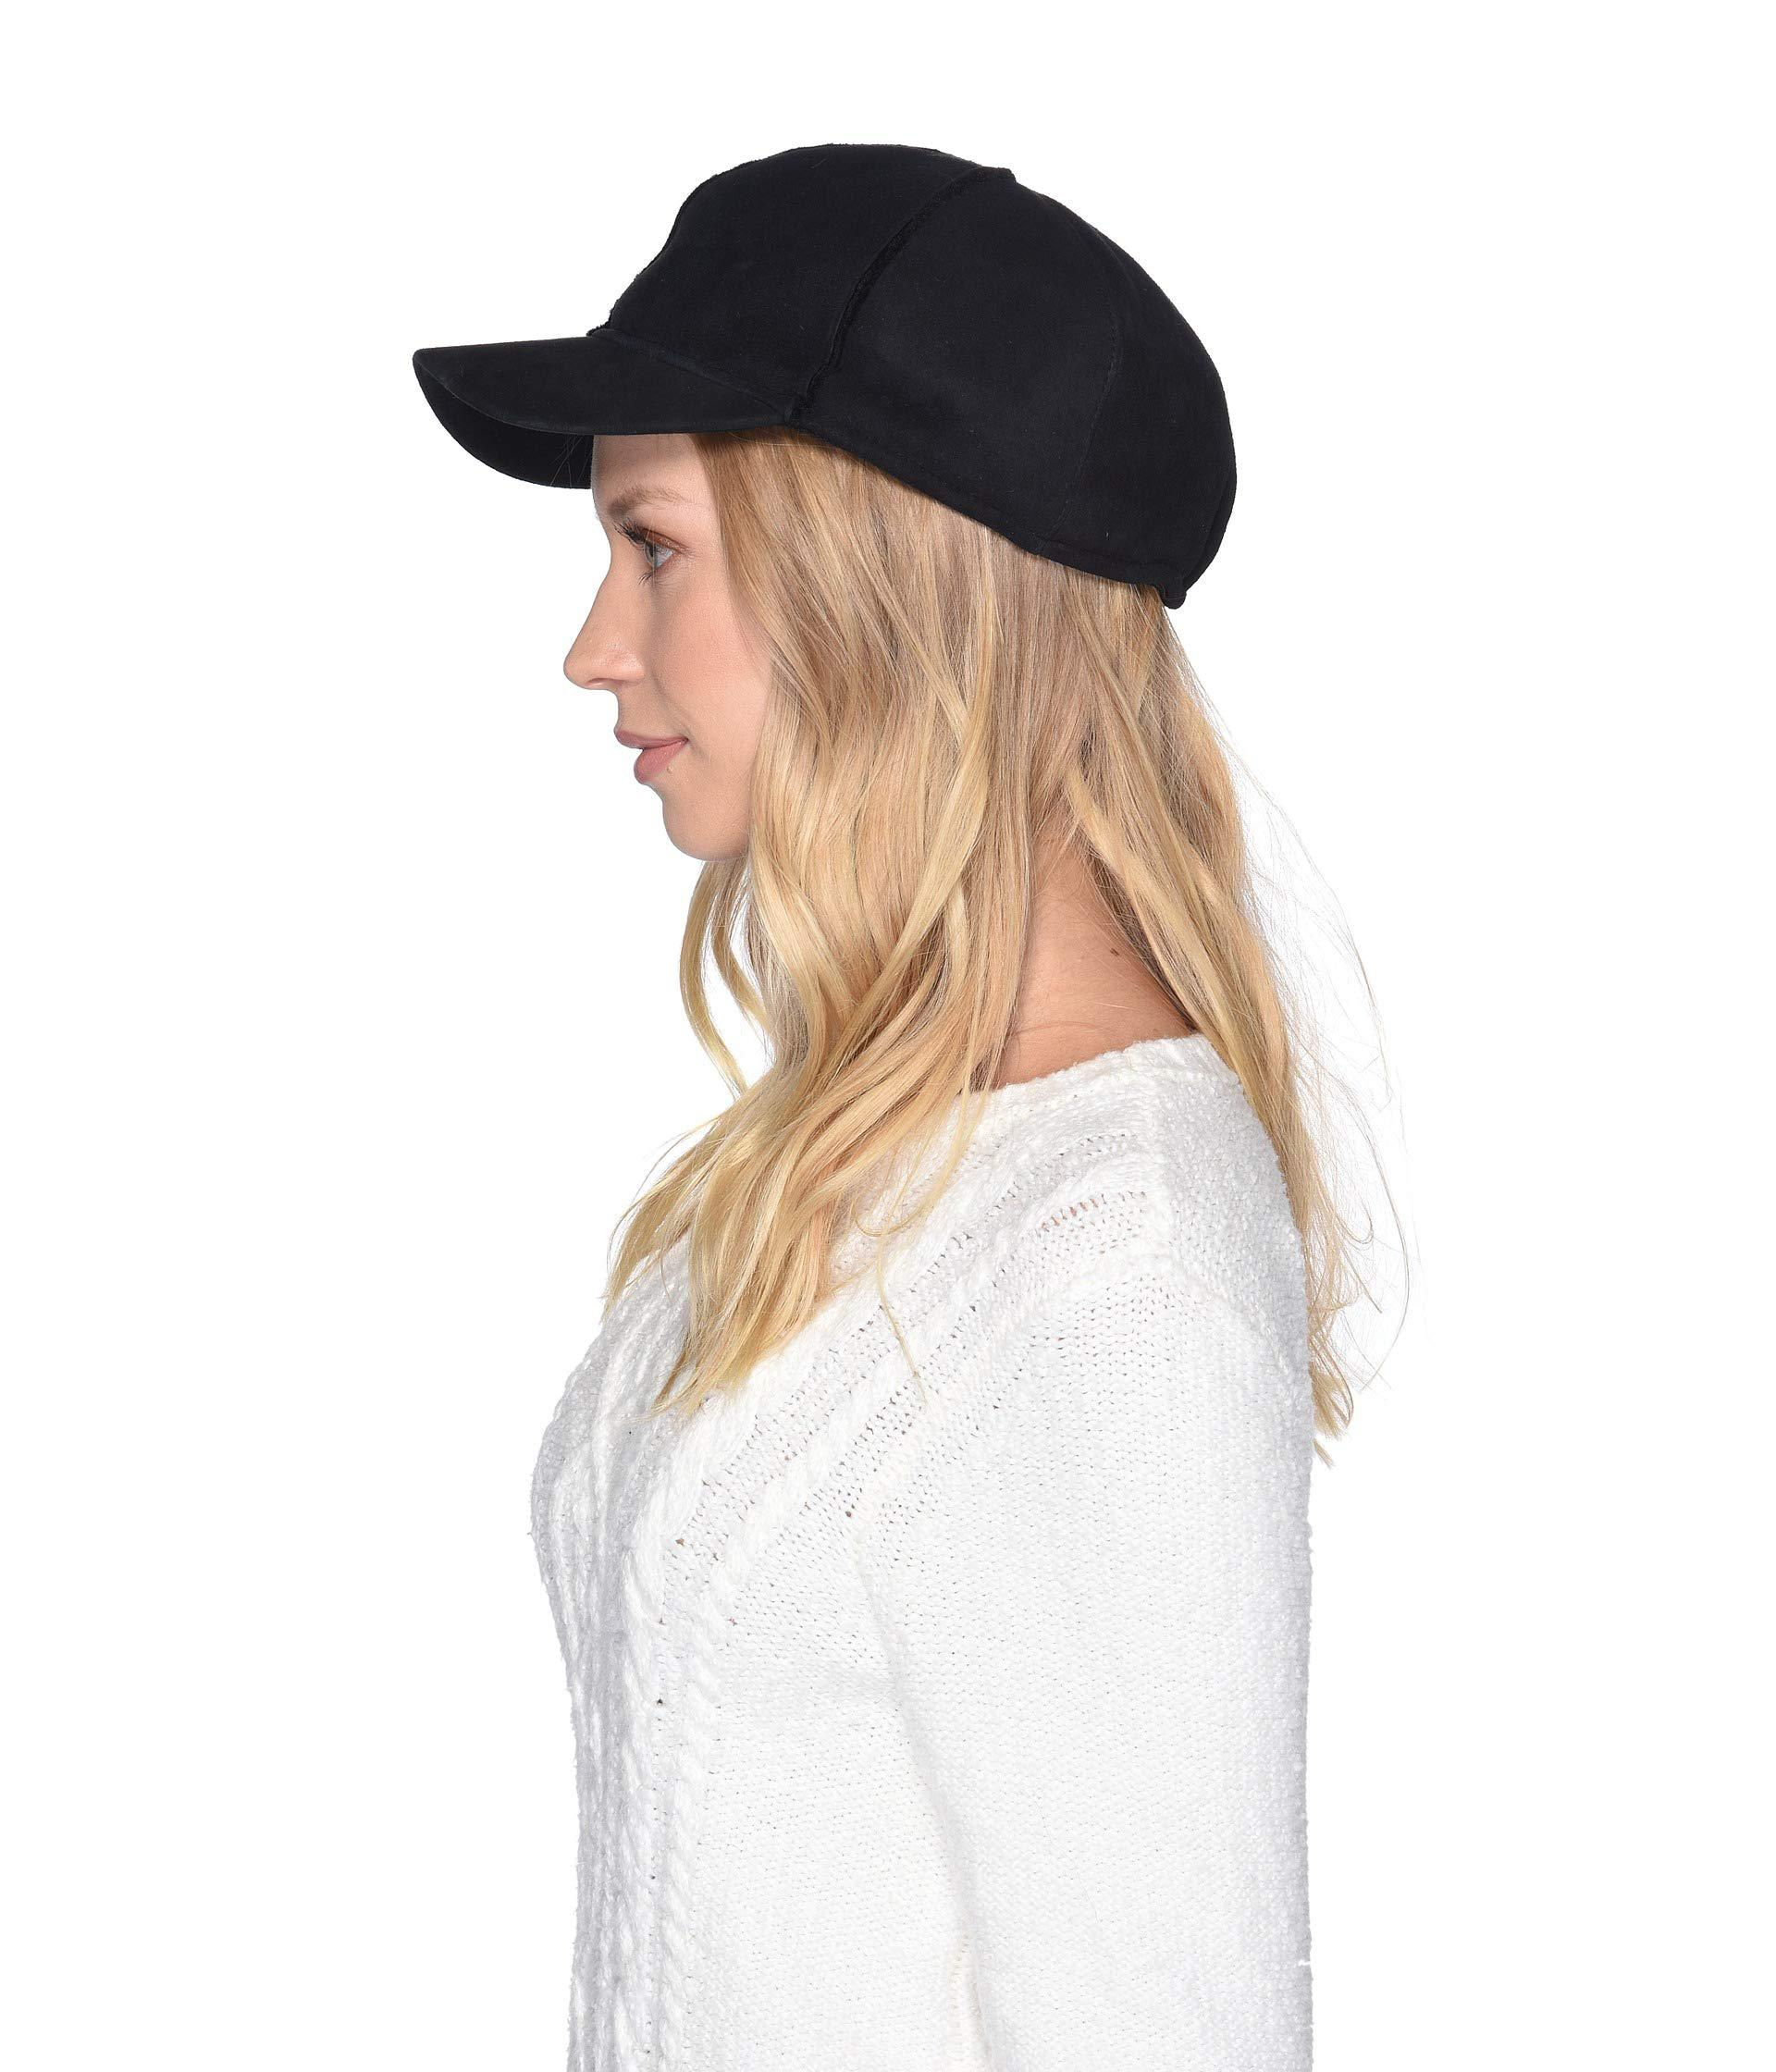 39780a303 Women's Exposed Seam Water Resistant Sheepskin Cap (black) Caps